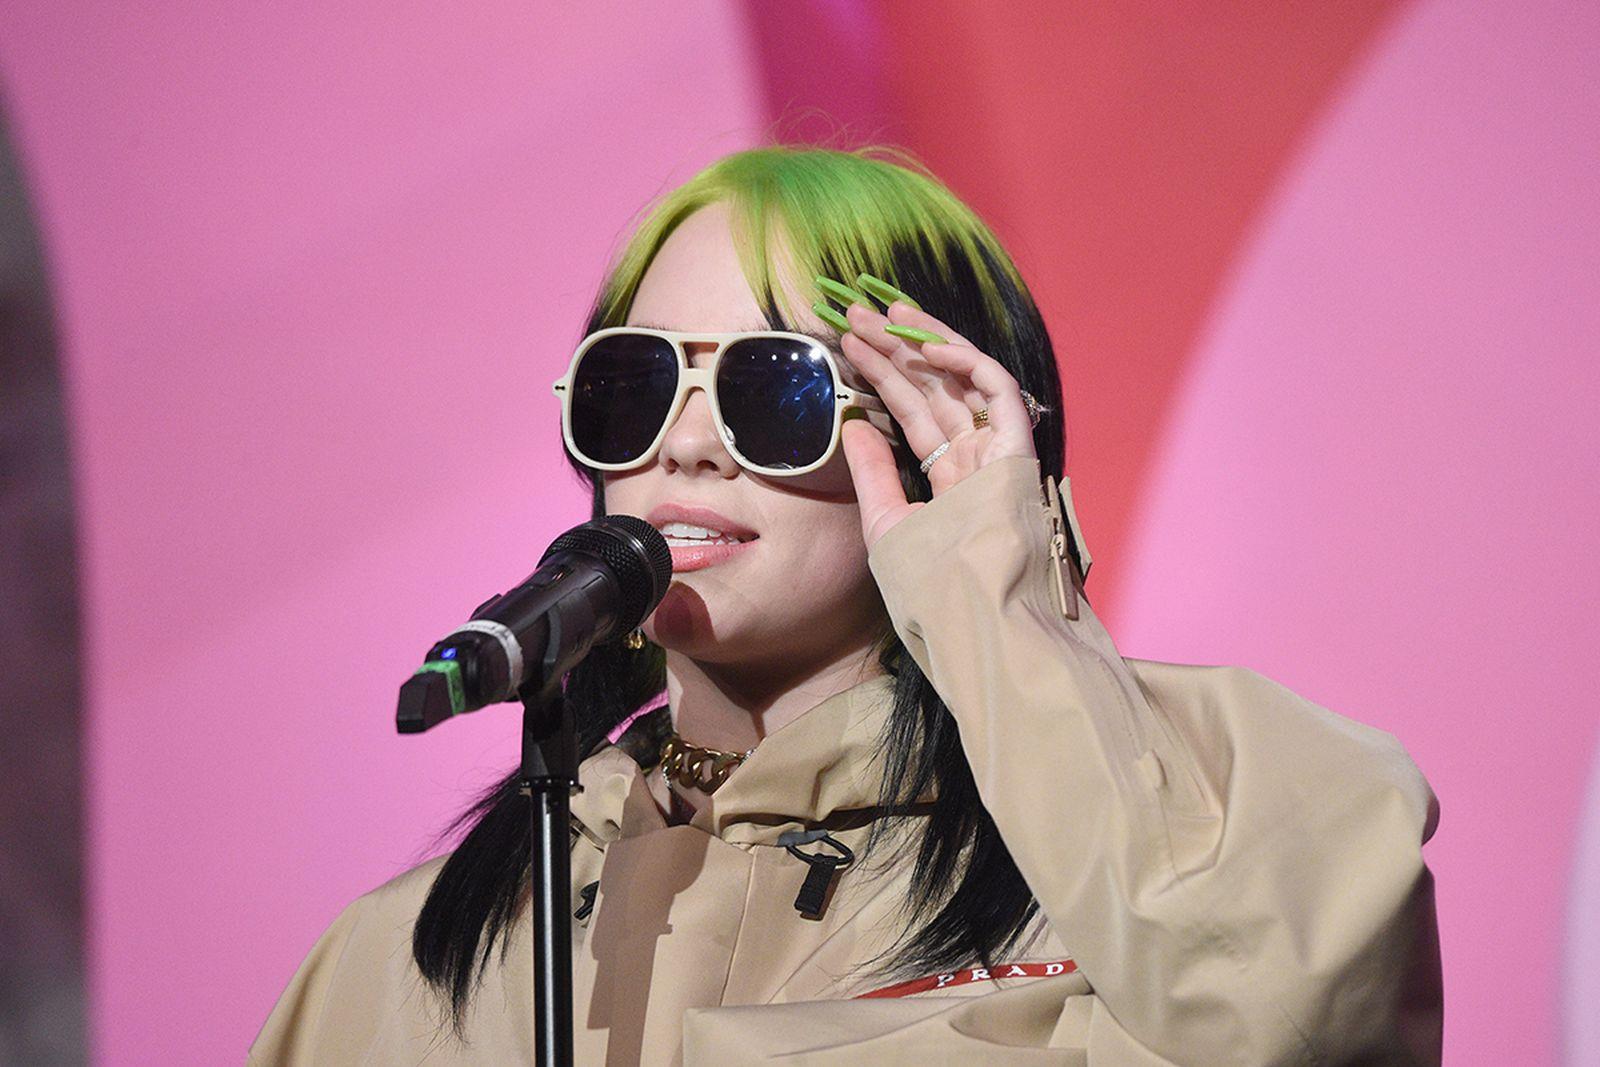 Billie Eilish sunglasses